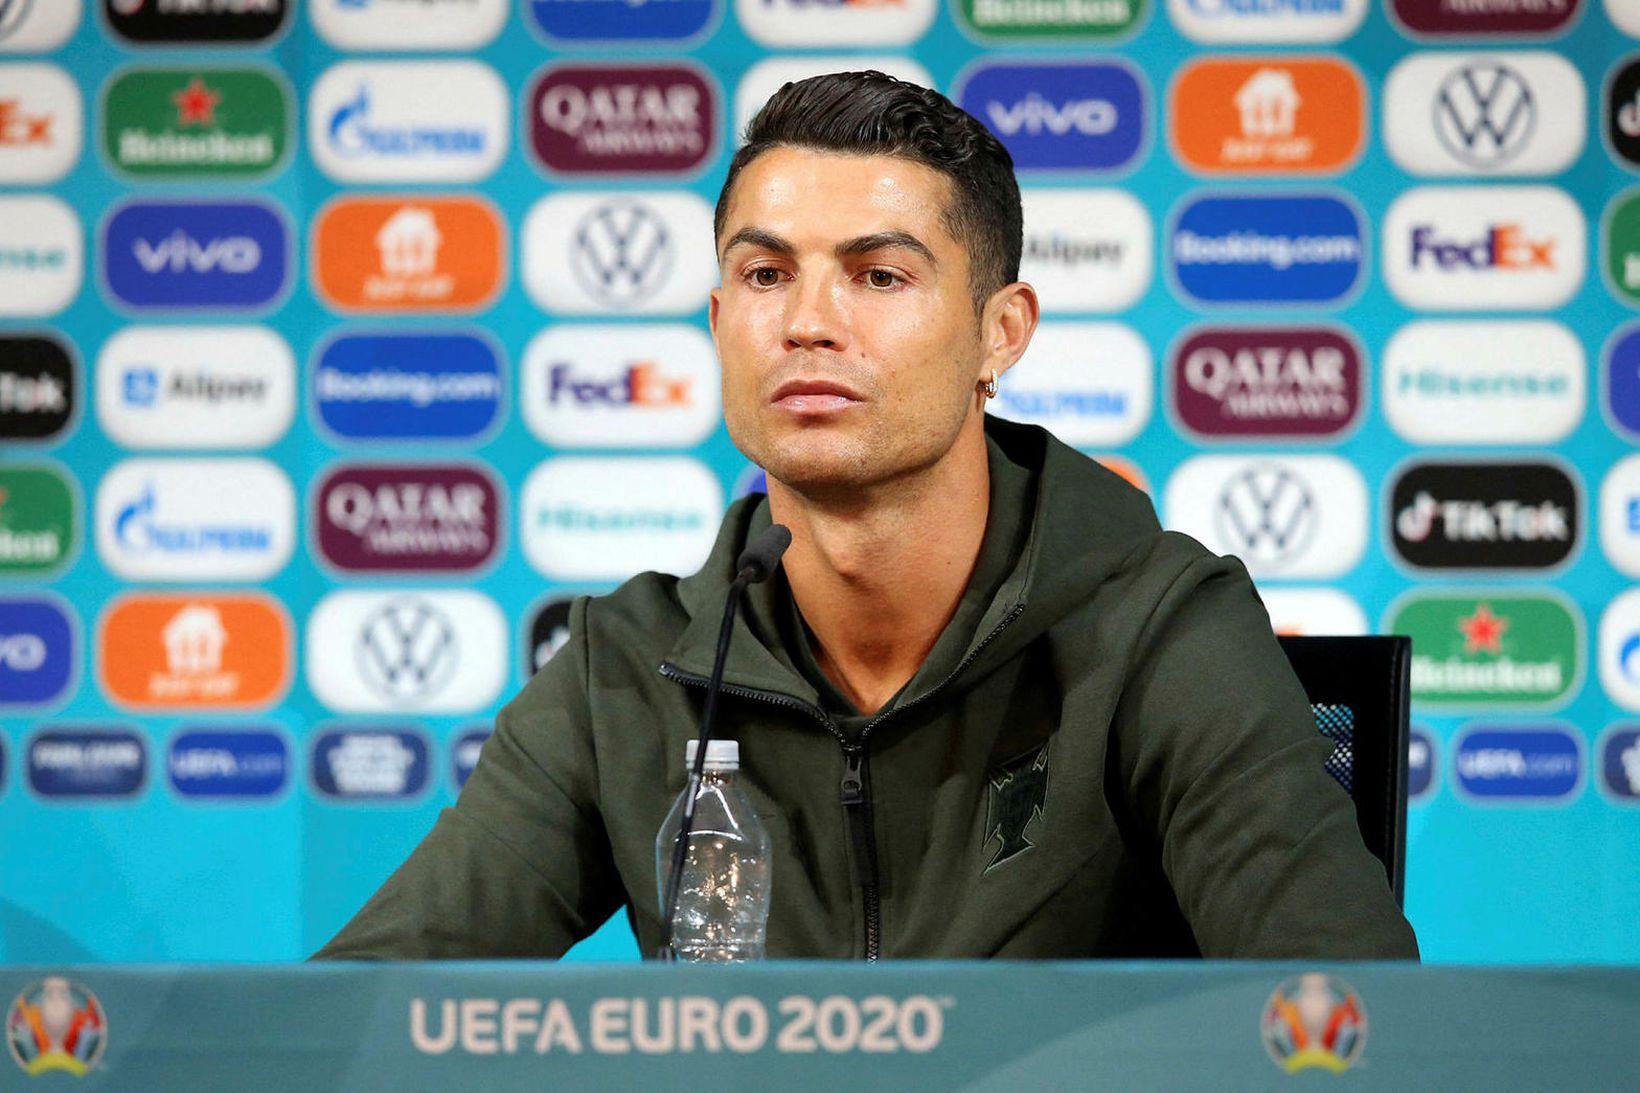 Cristiano Ronaldo með vatnsflöskuna góðu.